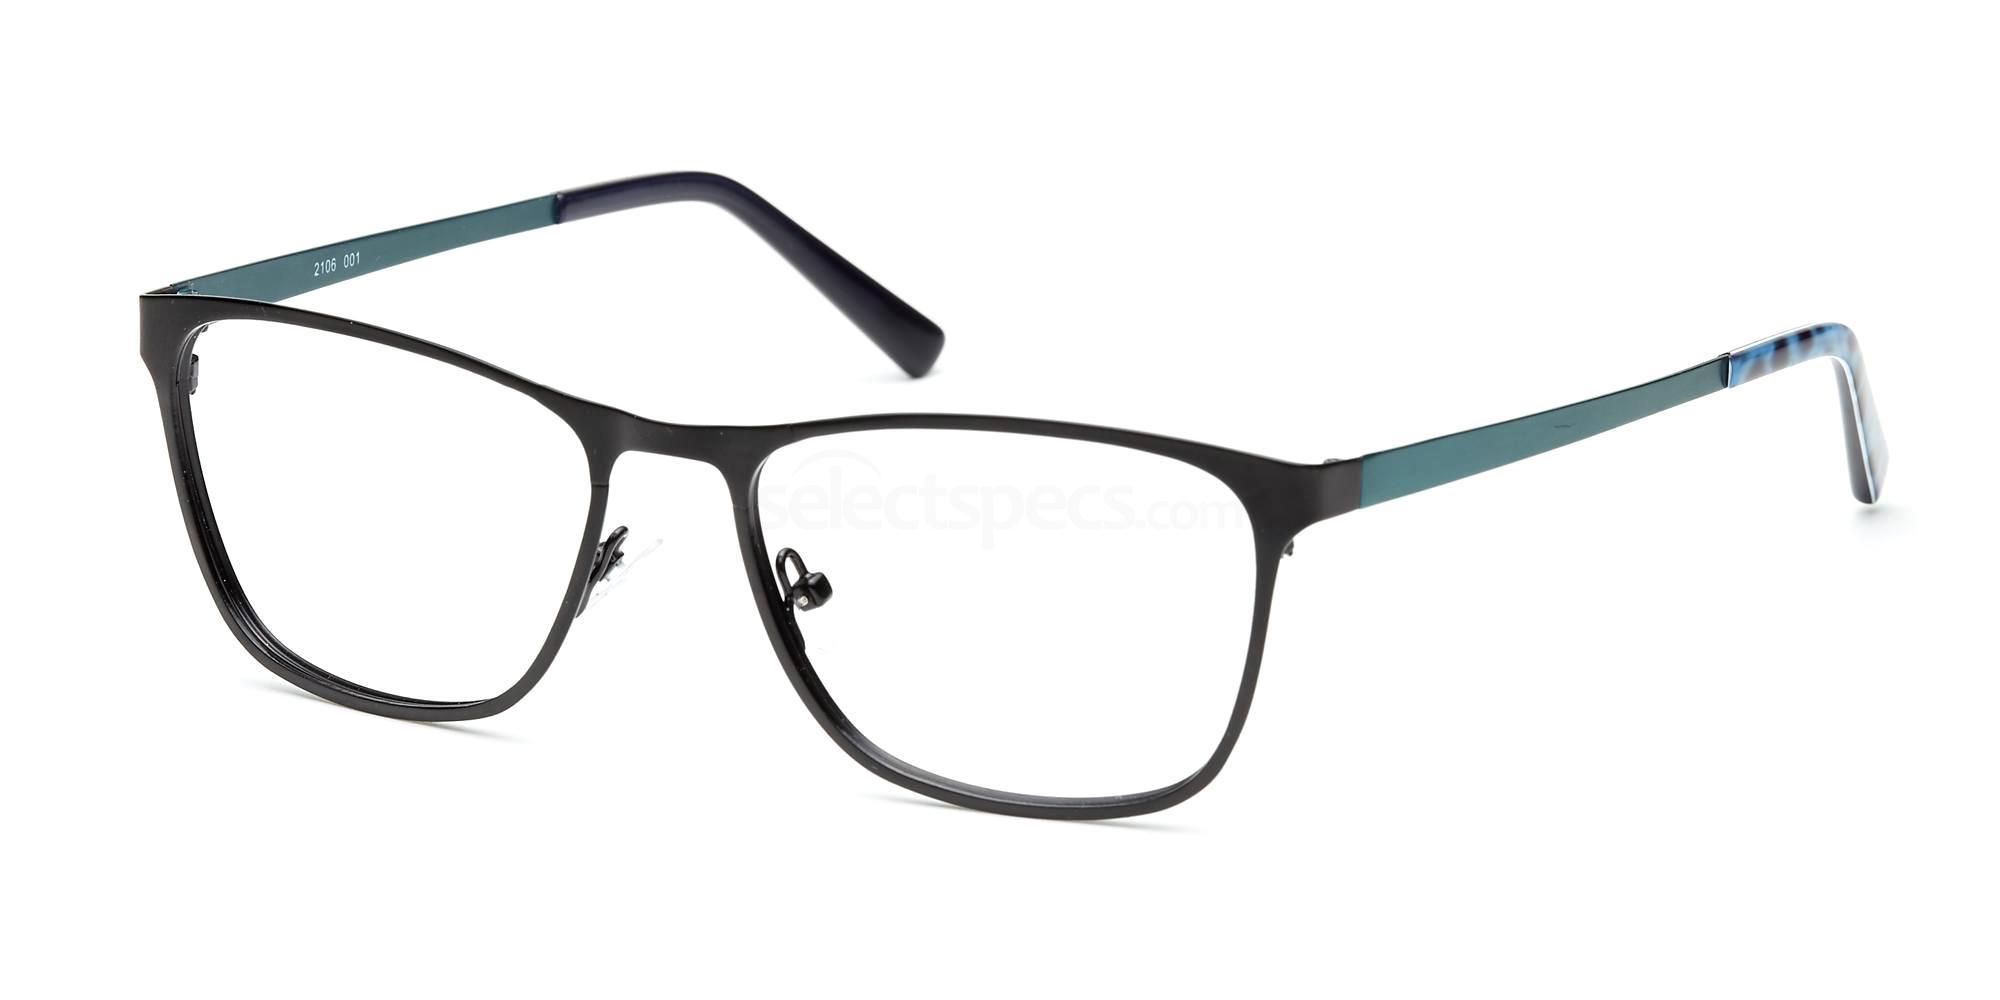 C1 FLX2106 Glasses, Flextra